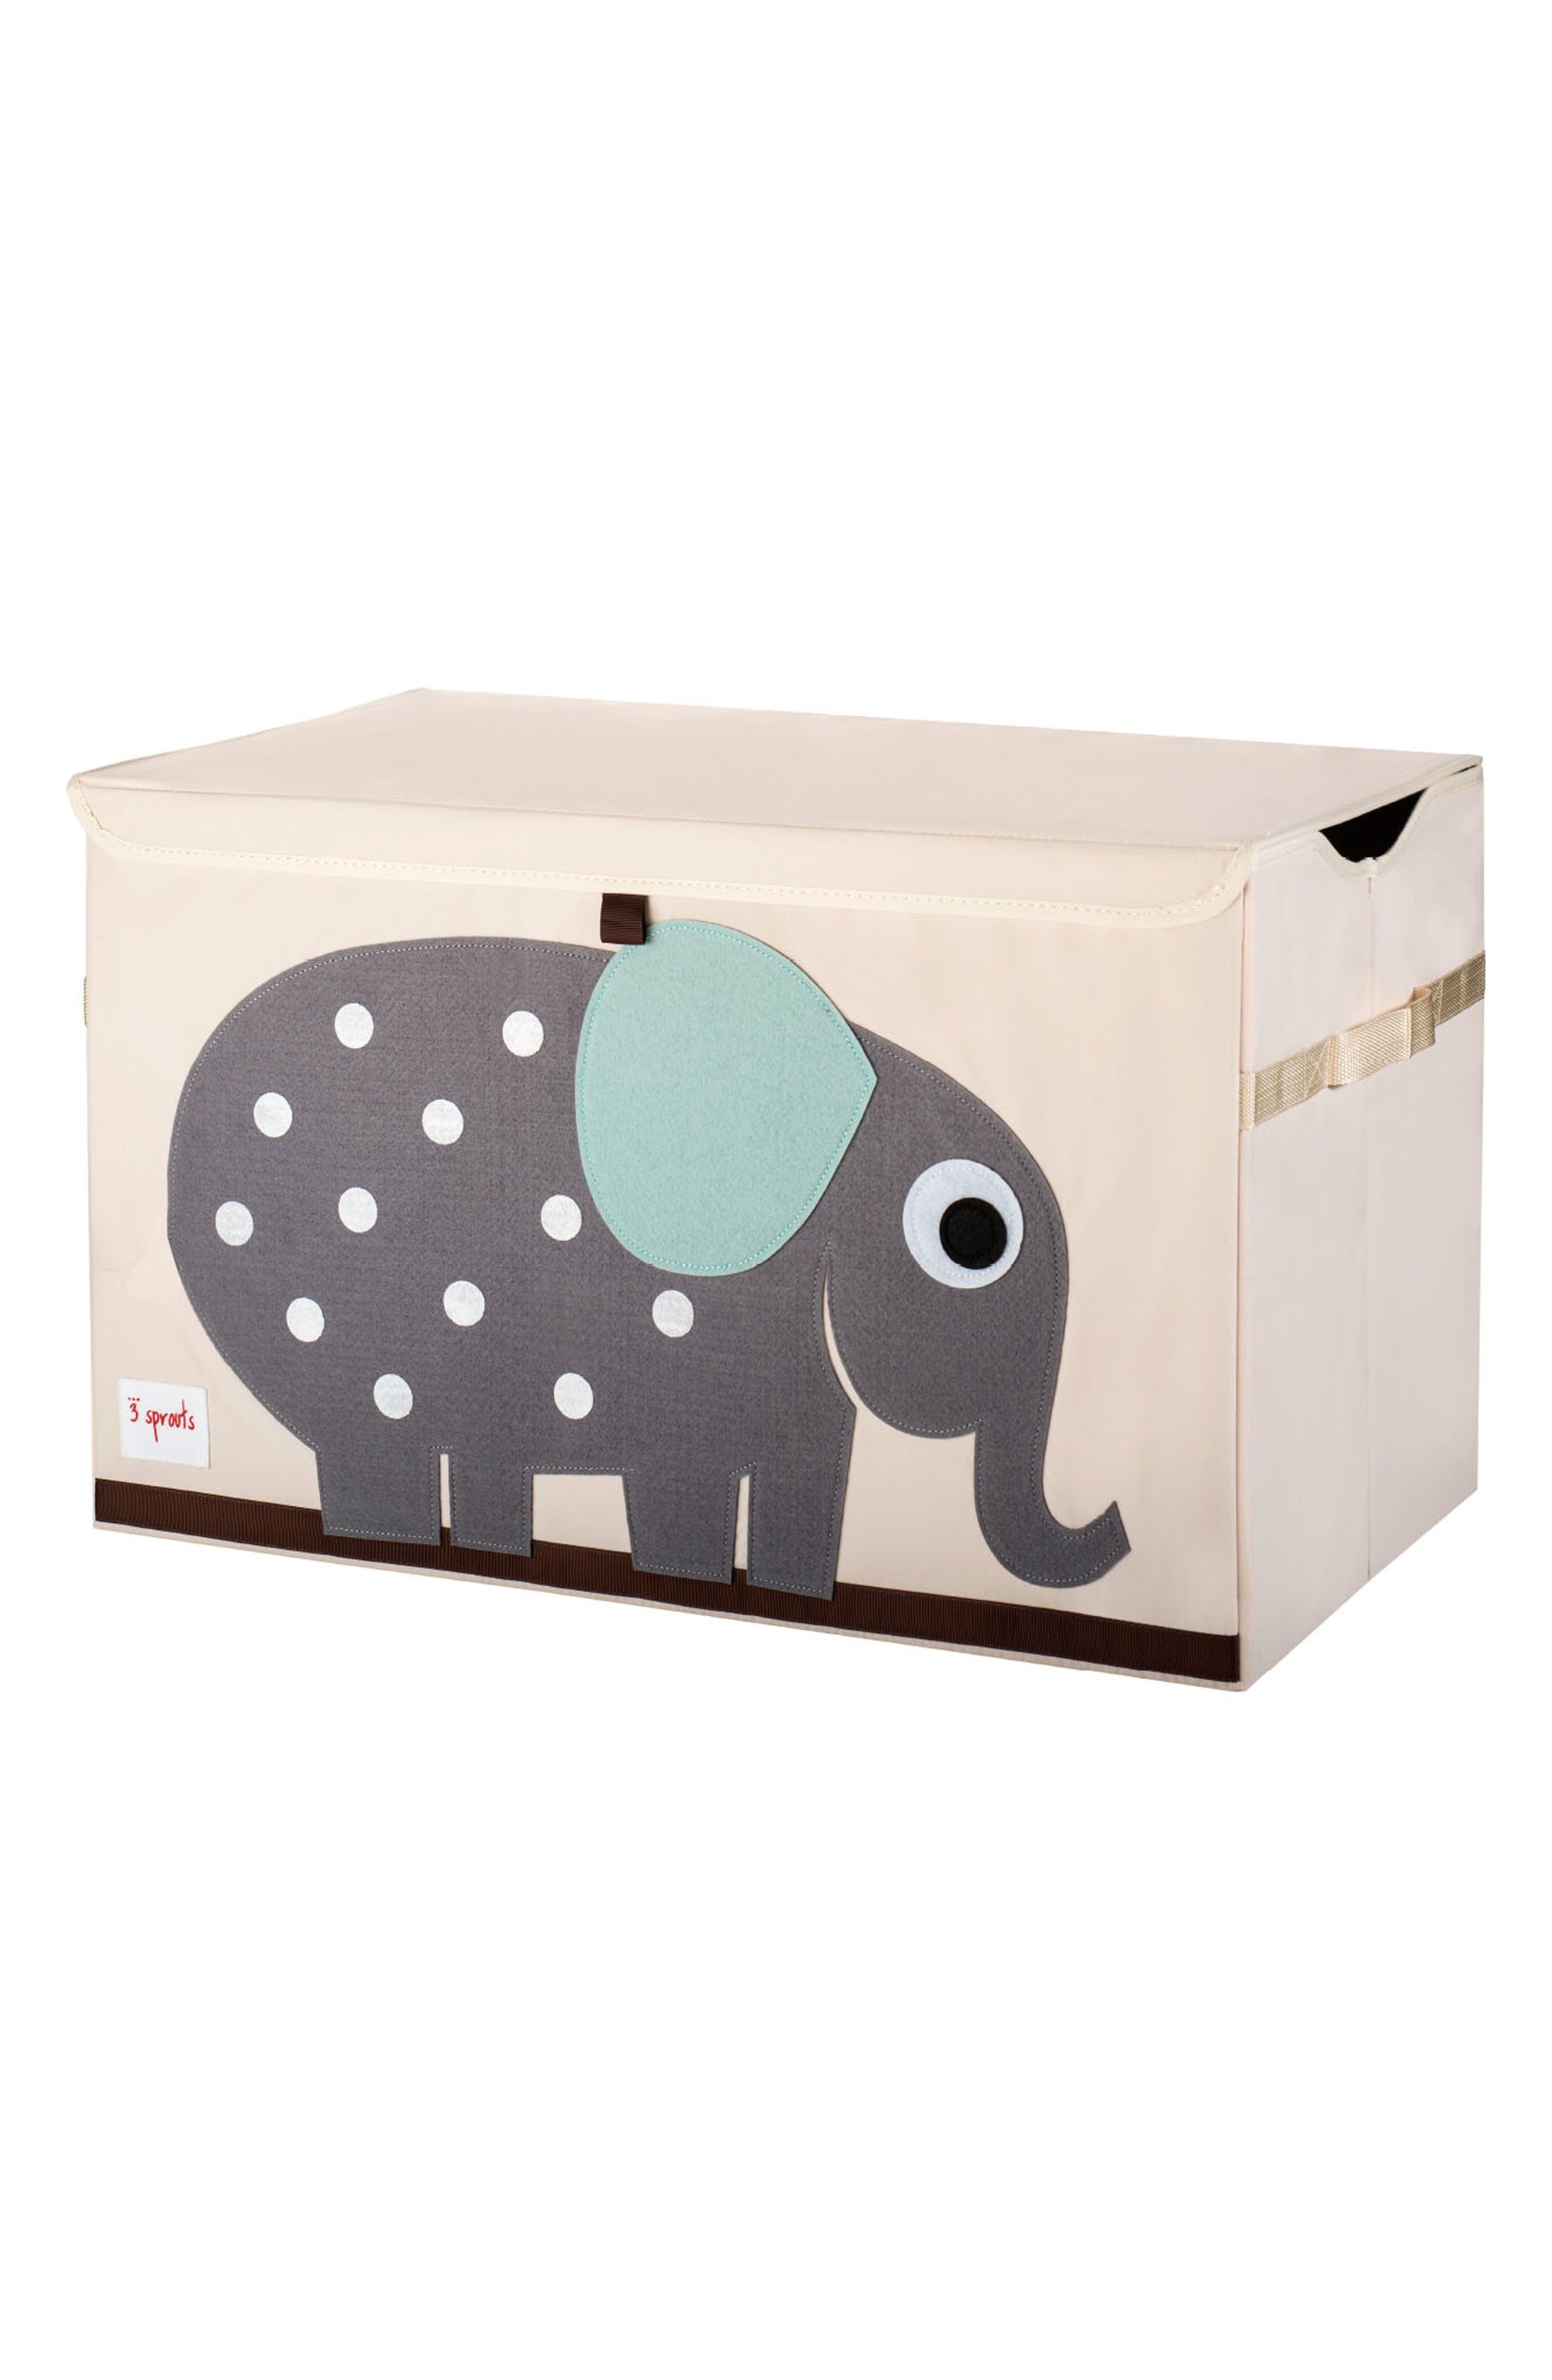 Elephant Toy Chest,                             Main thumbnail 1, color,                             020